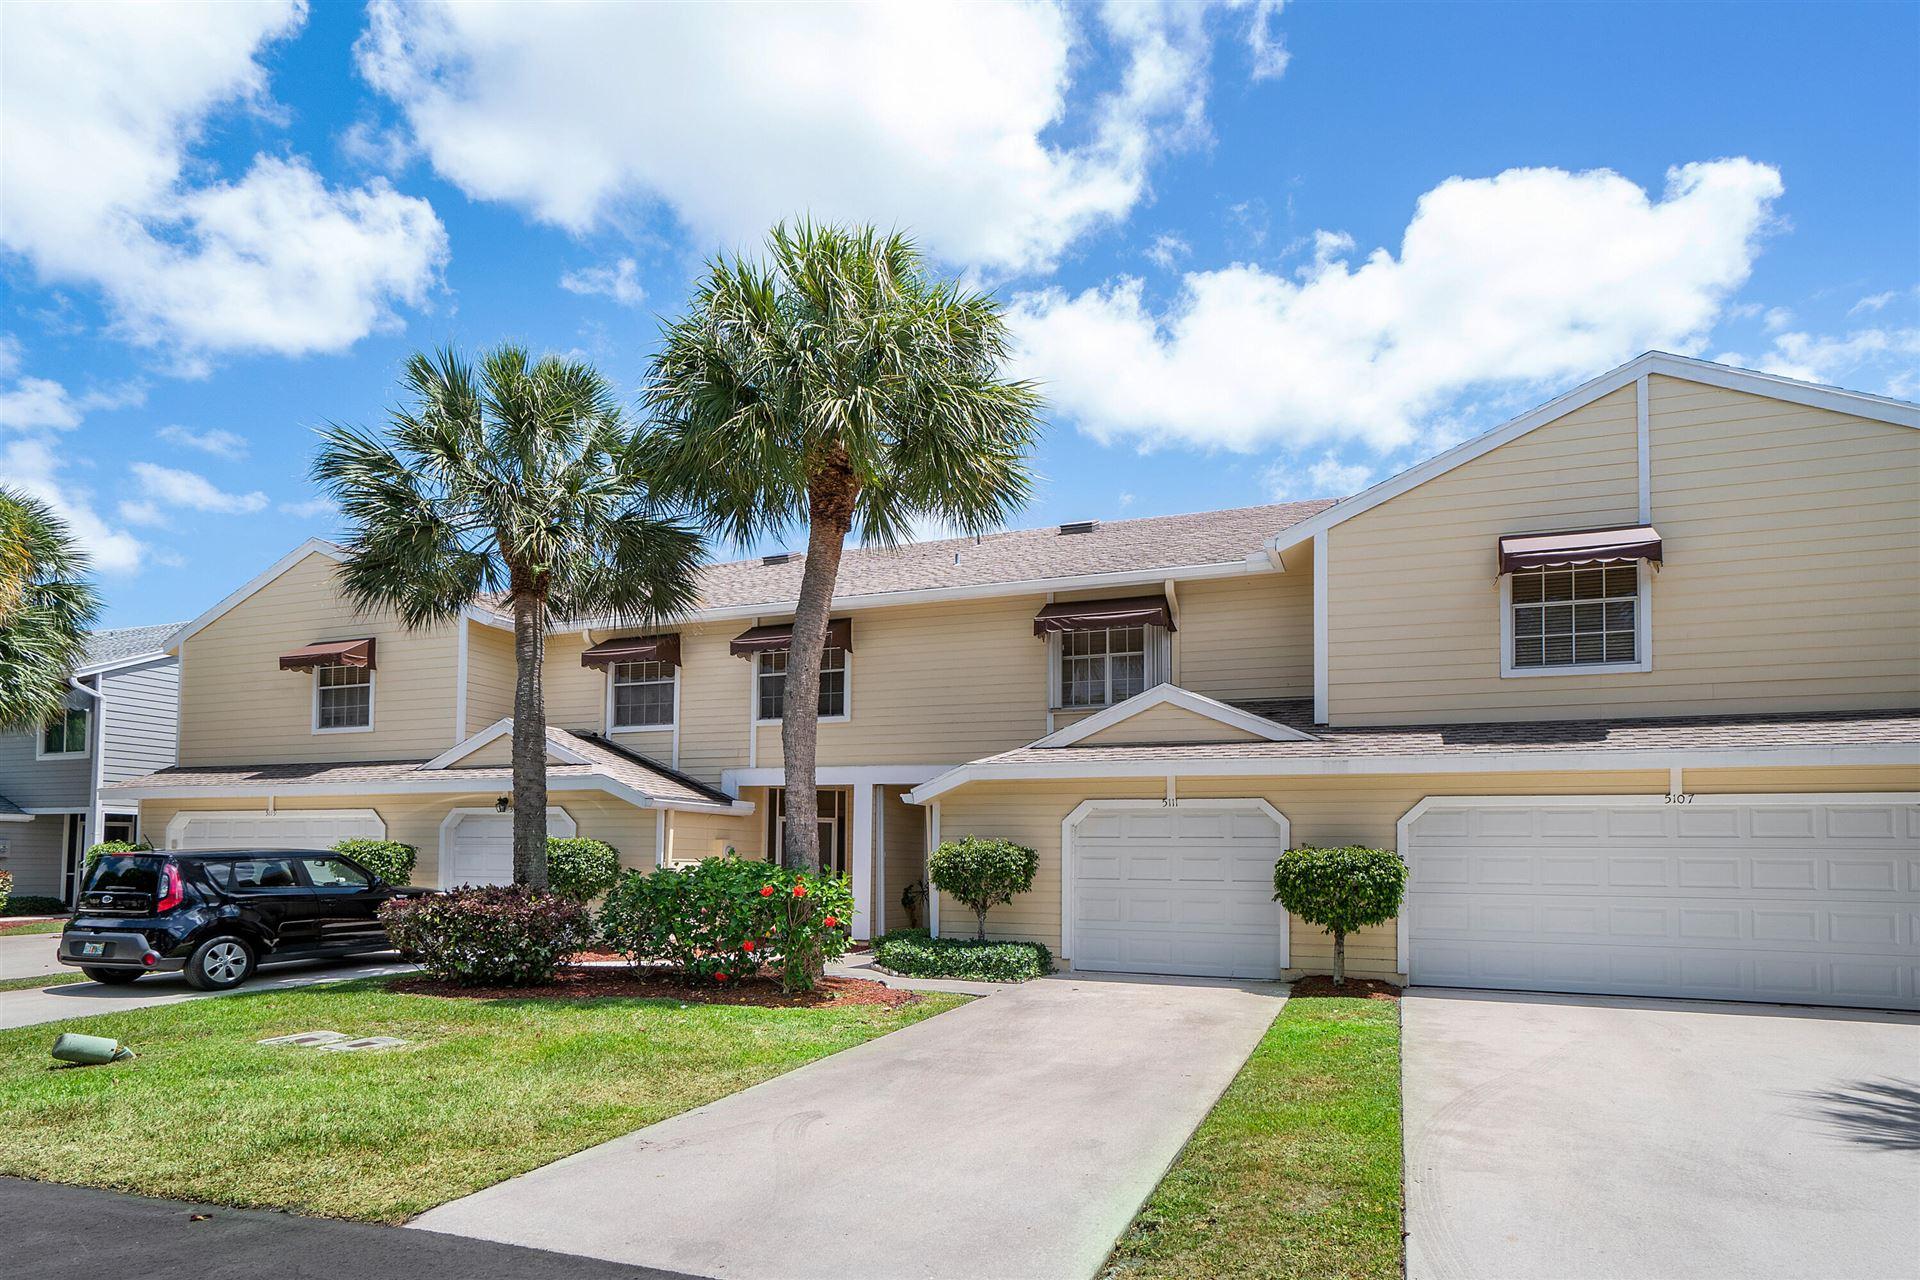 5111 Pointe Emerald Lane, Boca Raton, FL 33486 - #: RX-10722511